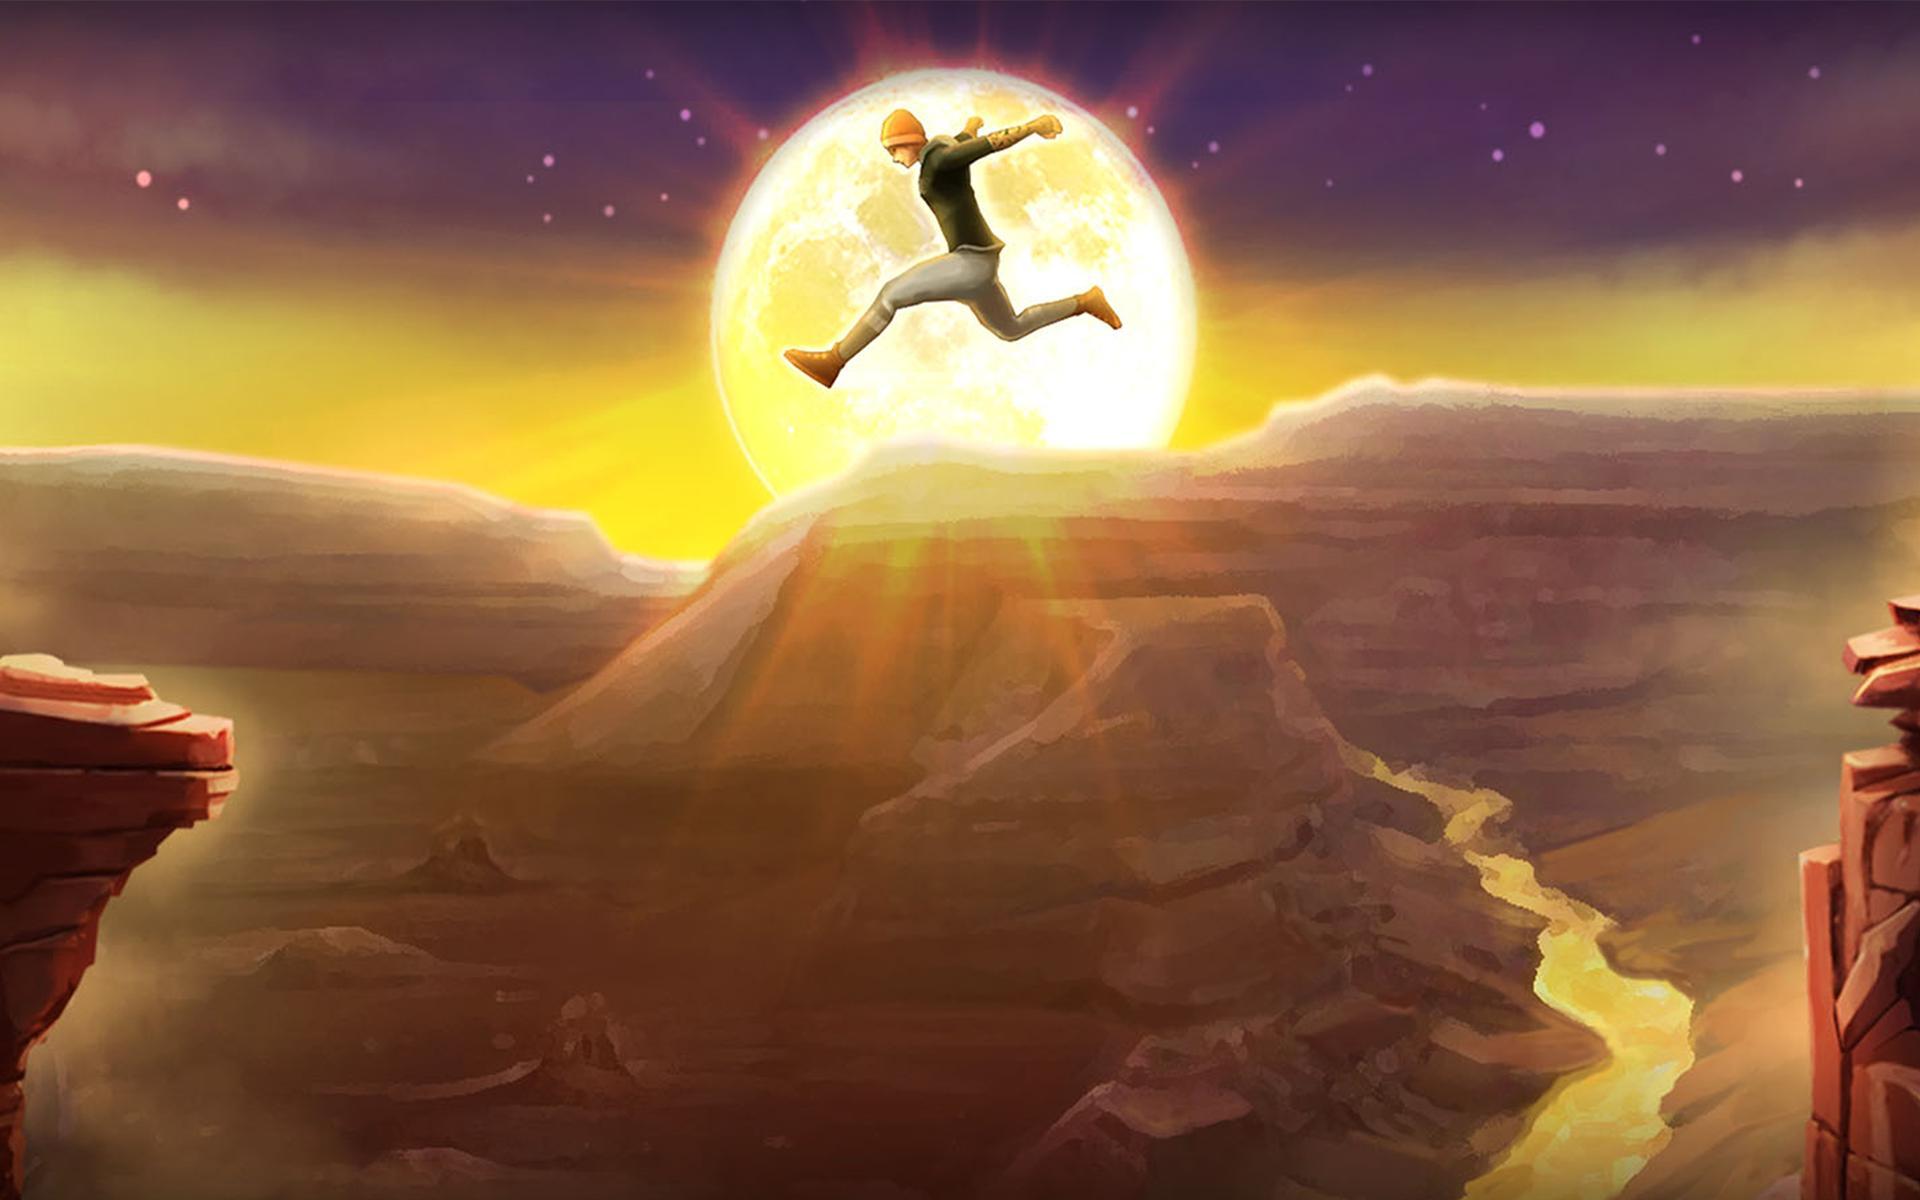 Sky Dancer Run - Running Game 4.2.0 Screenshot 19